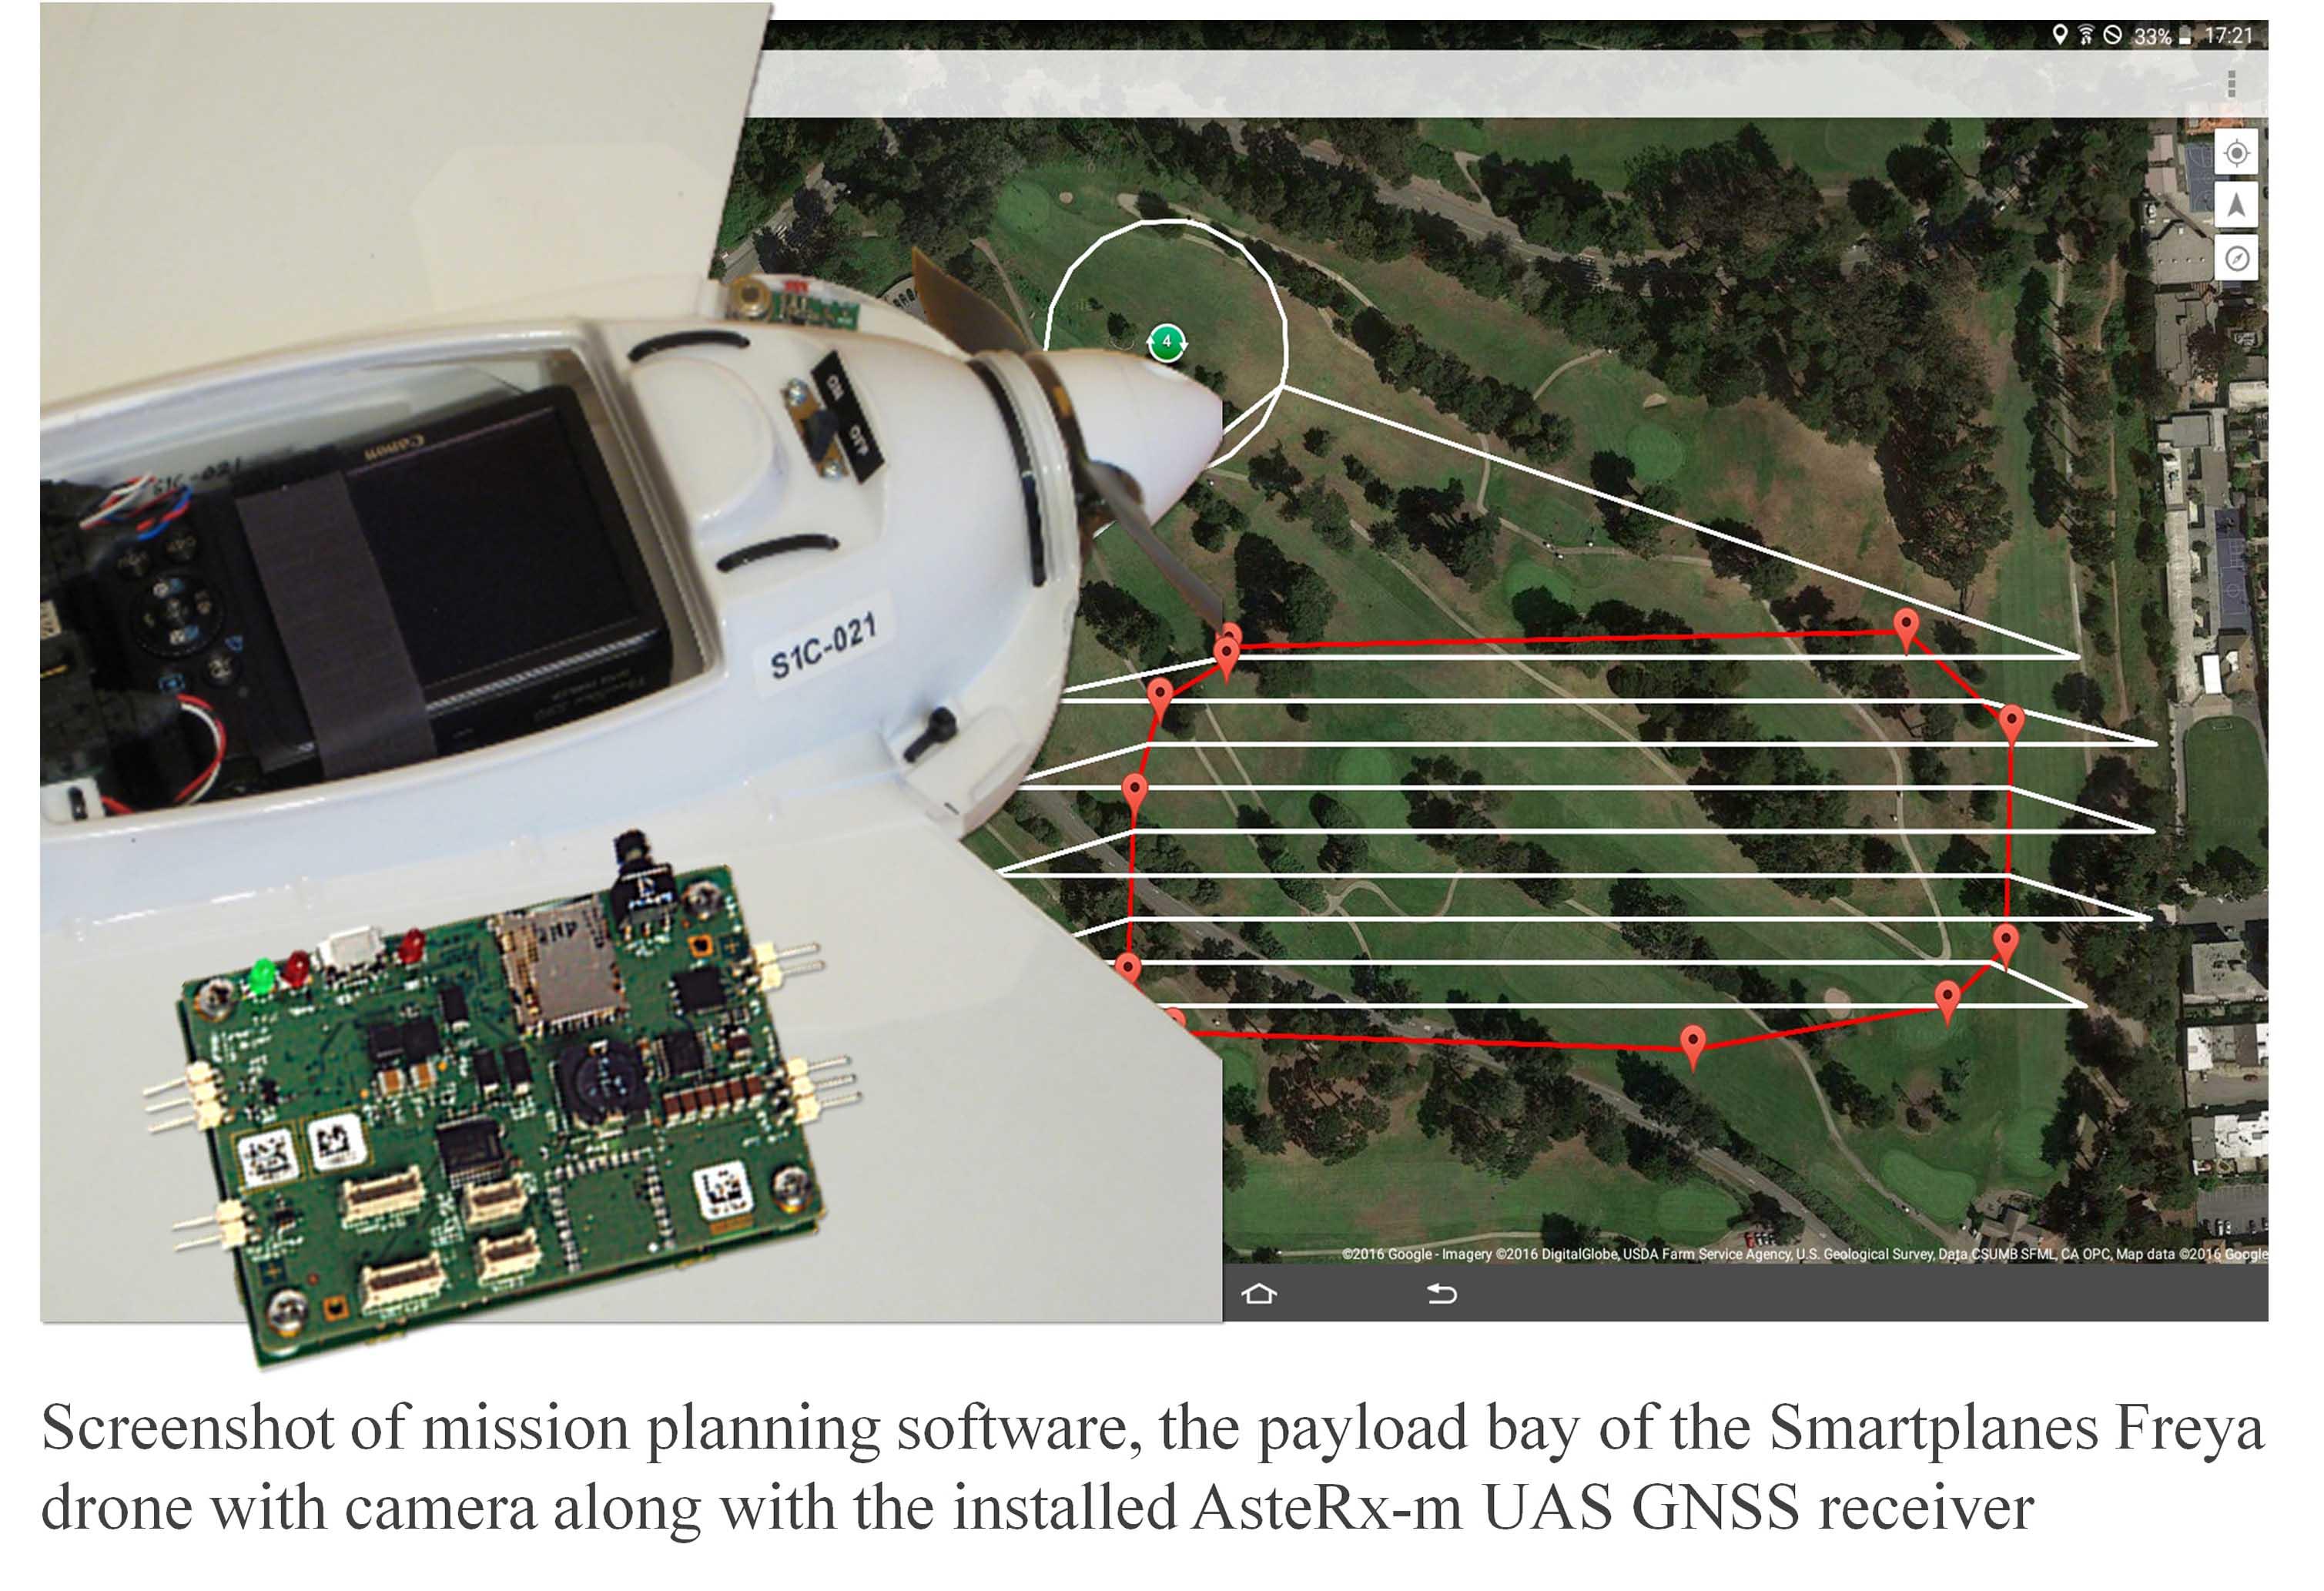 Septentrio_GNSS_accurate_reliable_receiver_bluetooth_PolaRx_AsteRx_Altus_Insight_Inshite_GeoTagZ_AsteRx-m_UAS_AsteRxm_AsteRx-m_UAV_Smartplanes_Drone_Freya_camera_surveying_no_GIS_sarah_dean